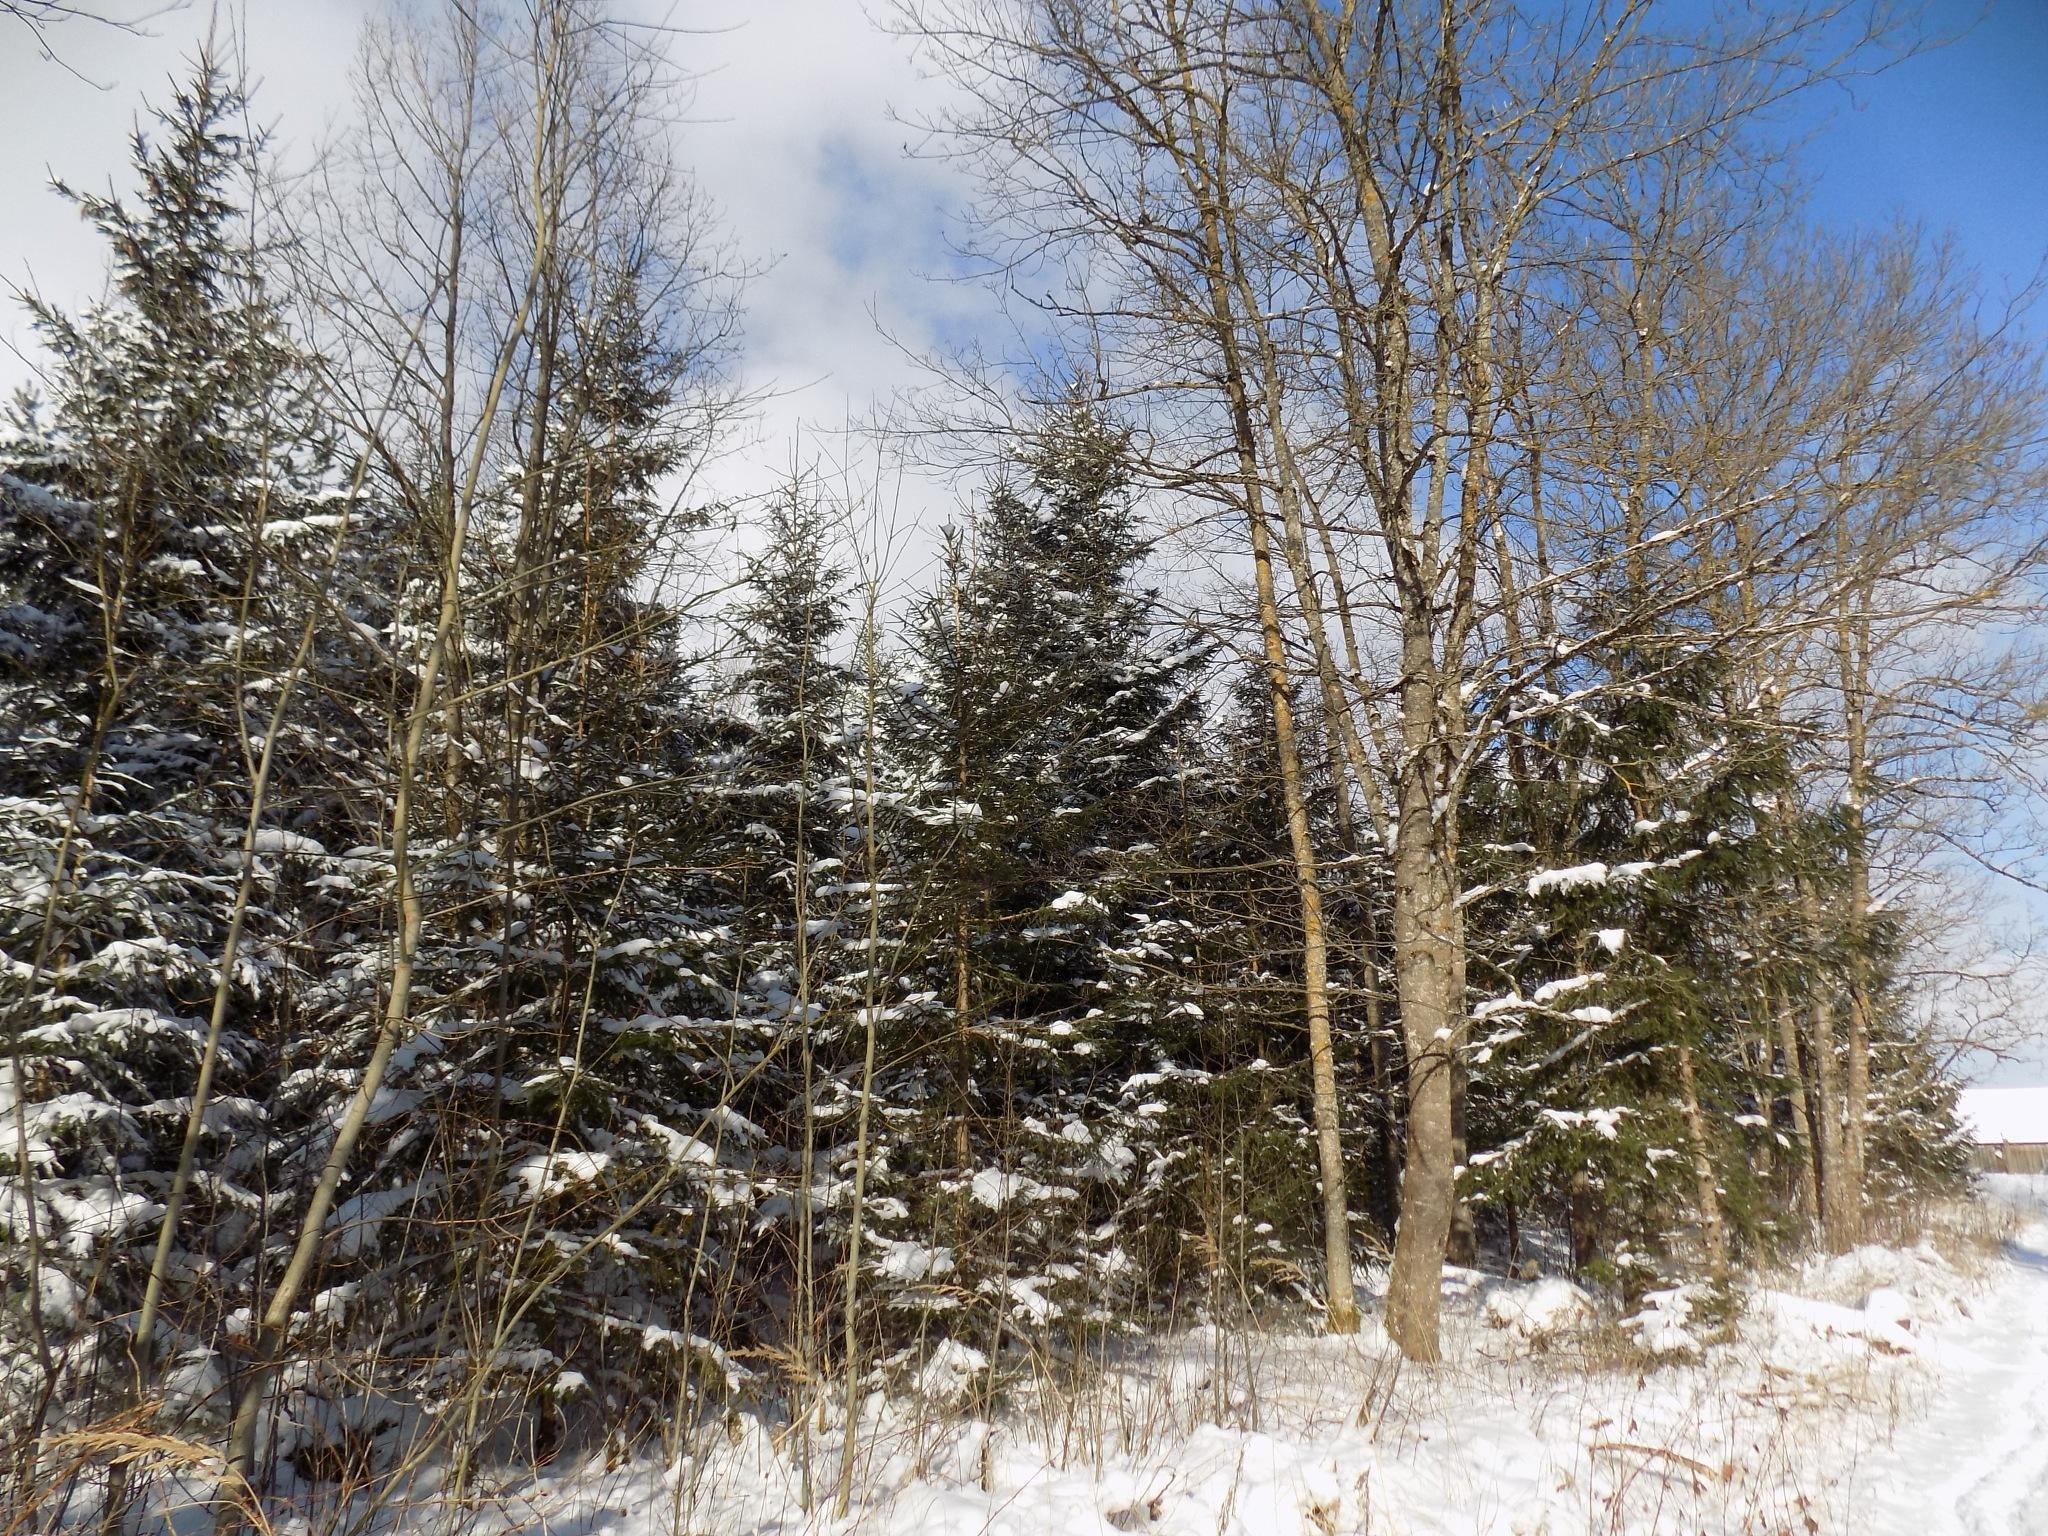 Nature in the winter by uzkuraitiene62